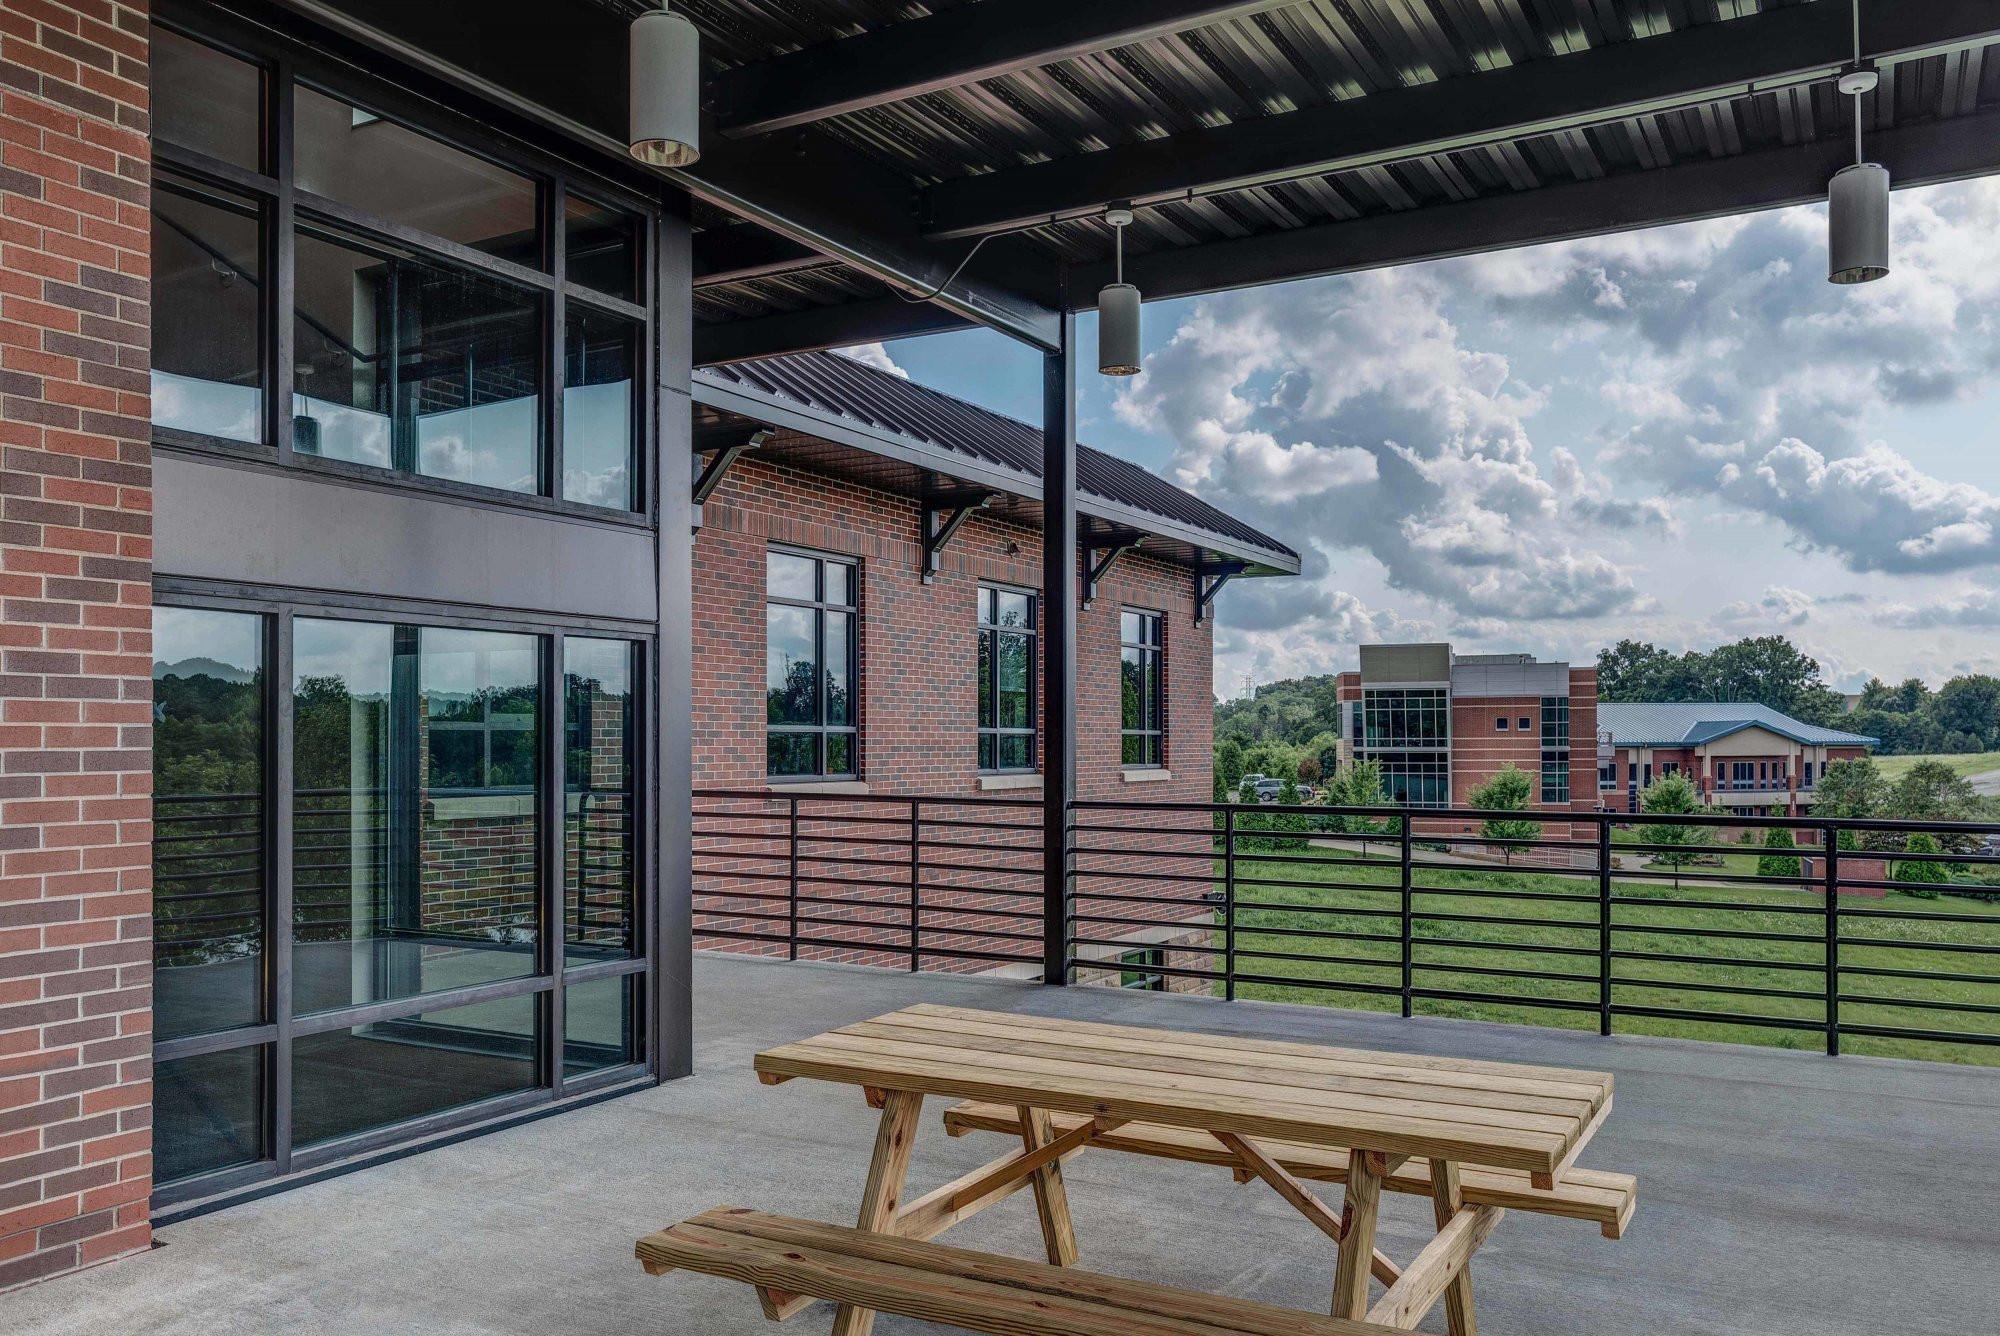 donan-engineering-new-headquarters-office-building-exterior-patio